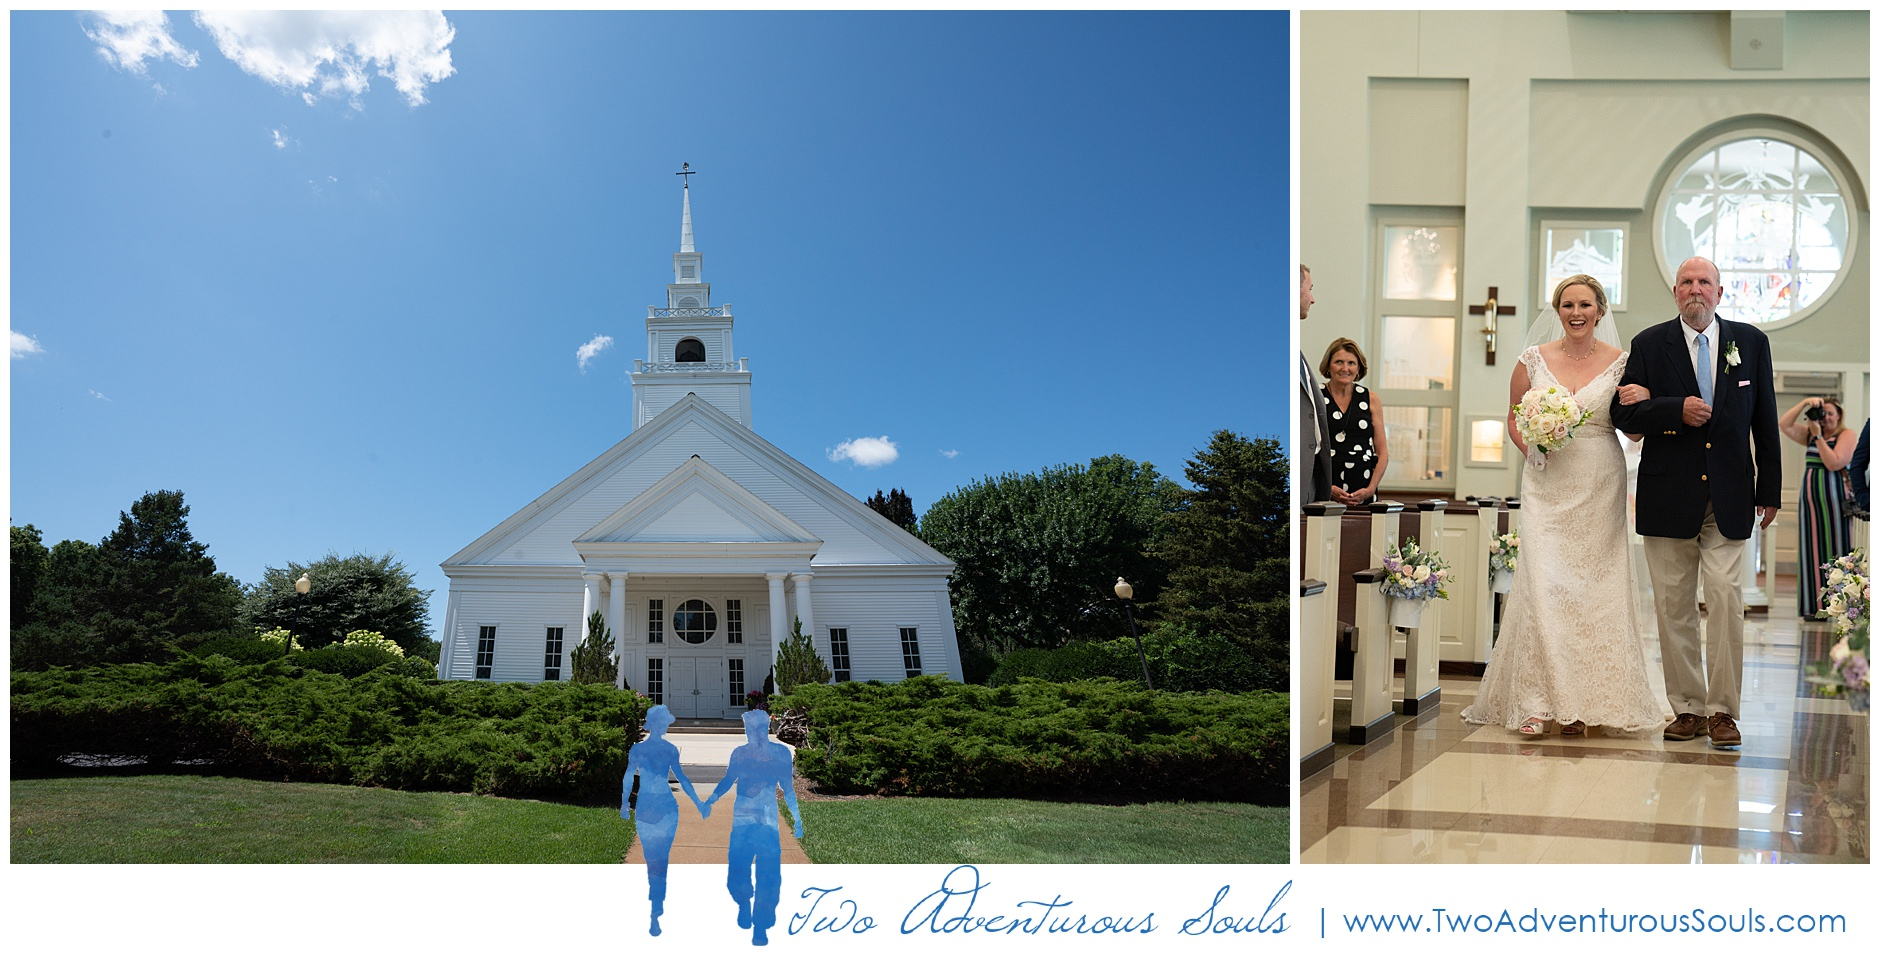 Cape Cod Wedding Photographers, Destination Wedding Photographers, Two Adventurous Souls-081019_0018.jpg